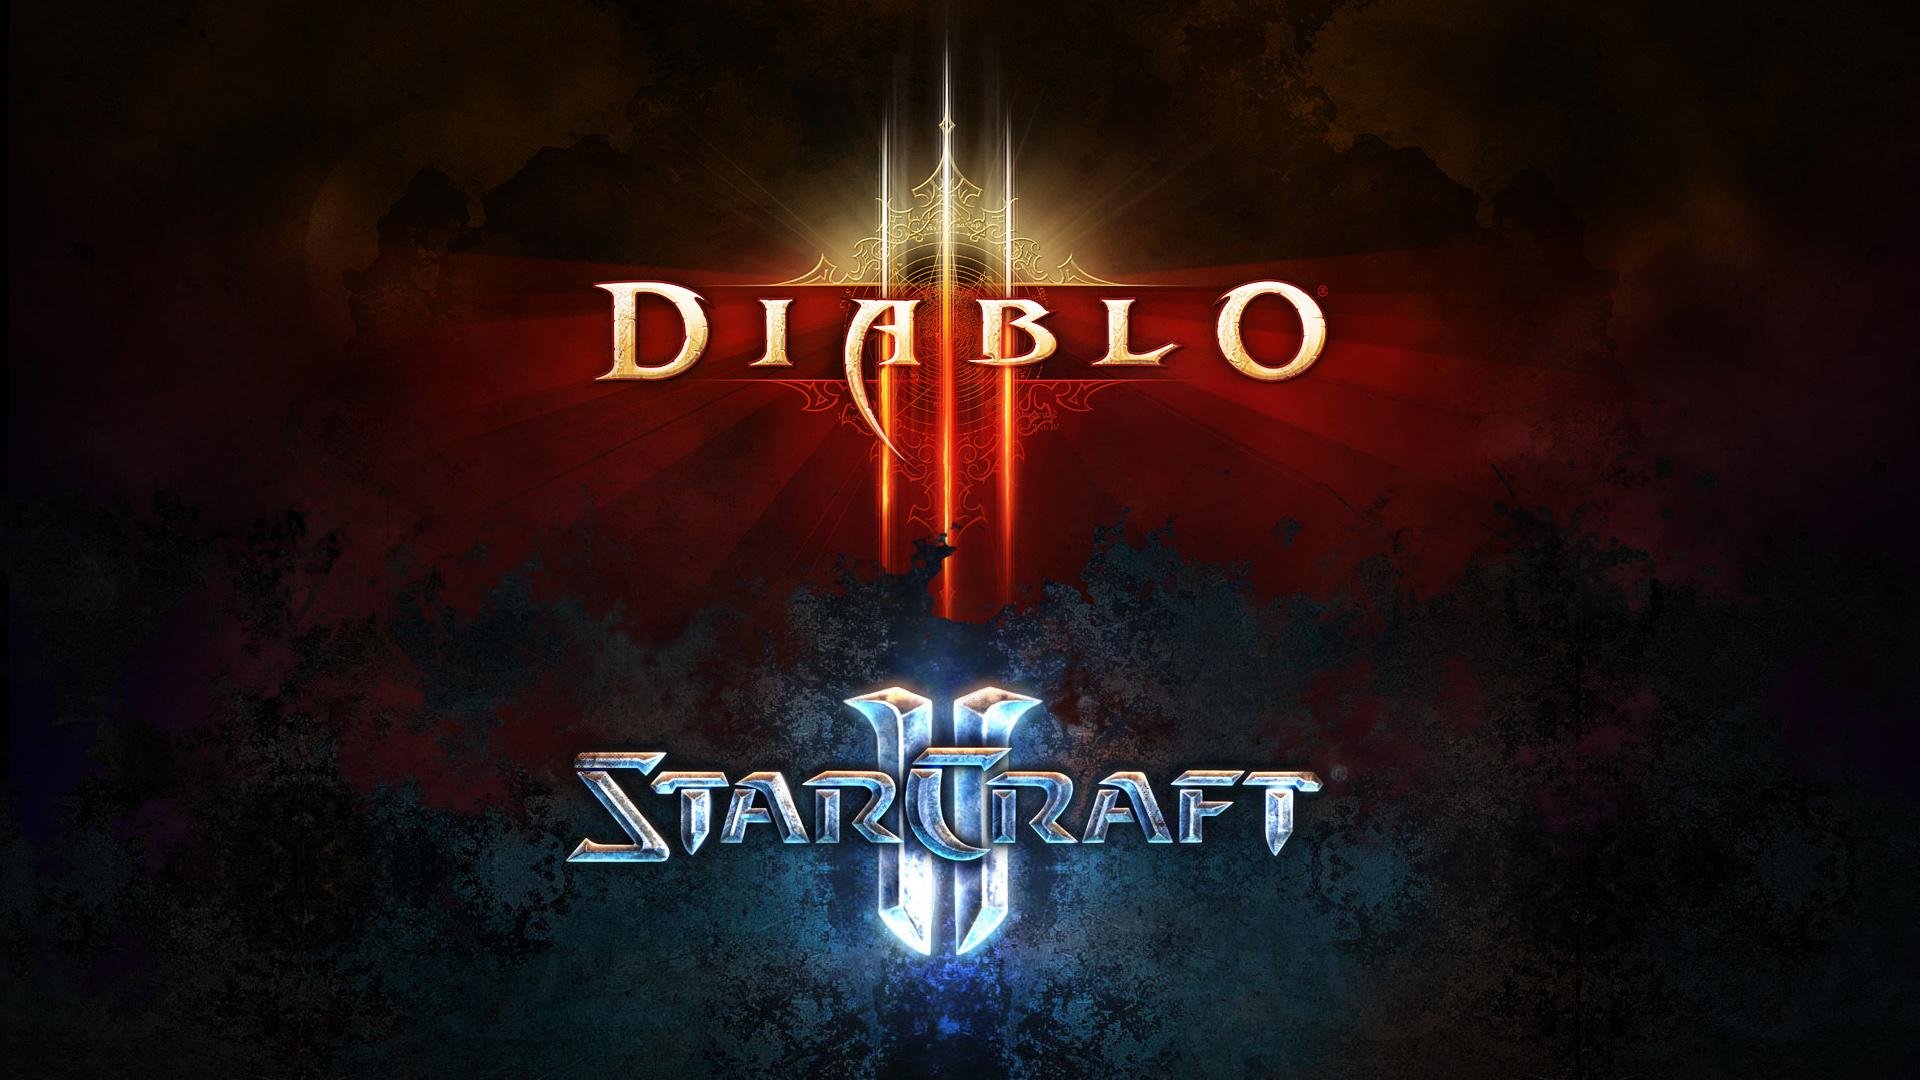 Diablo 3 vs StarCraft 2